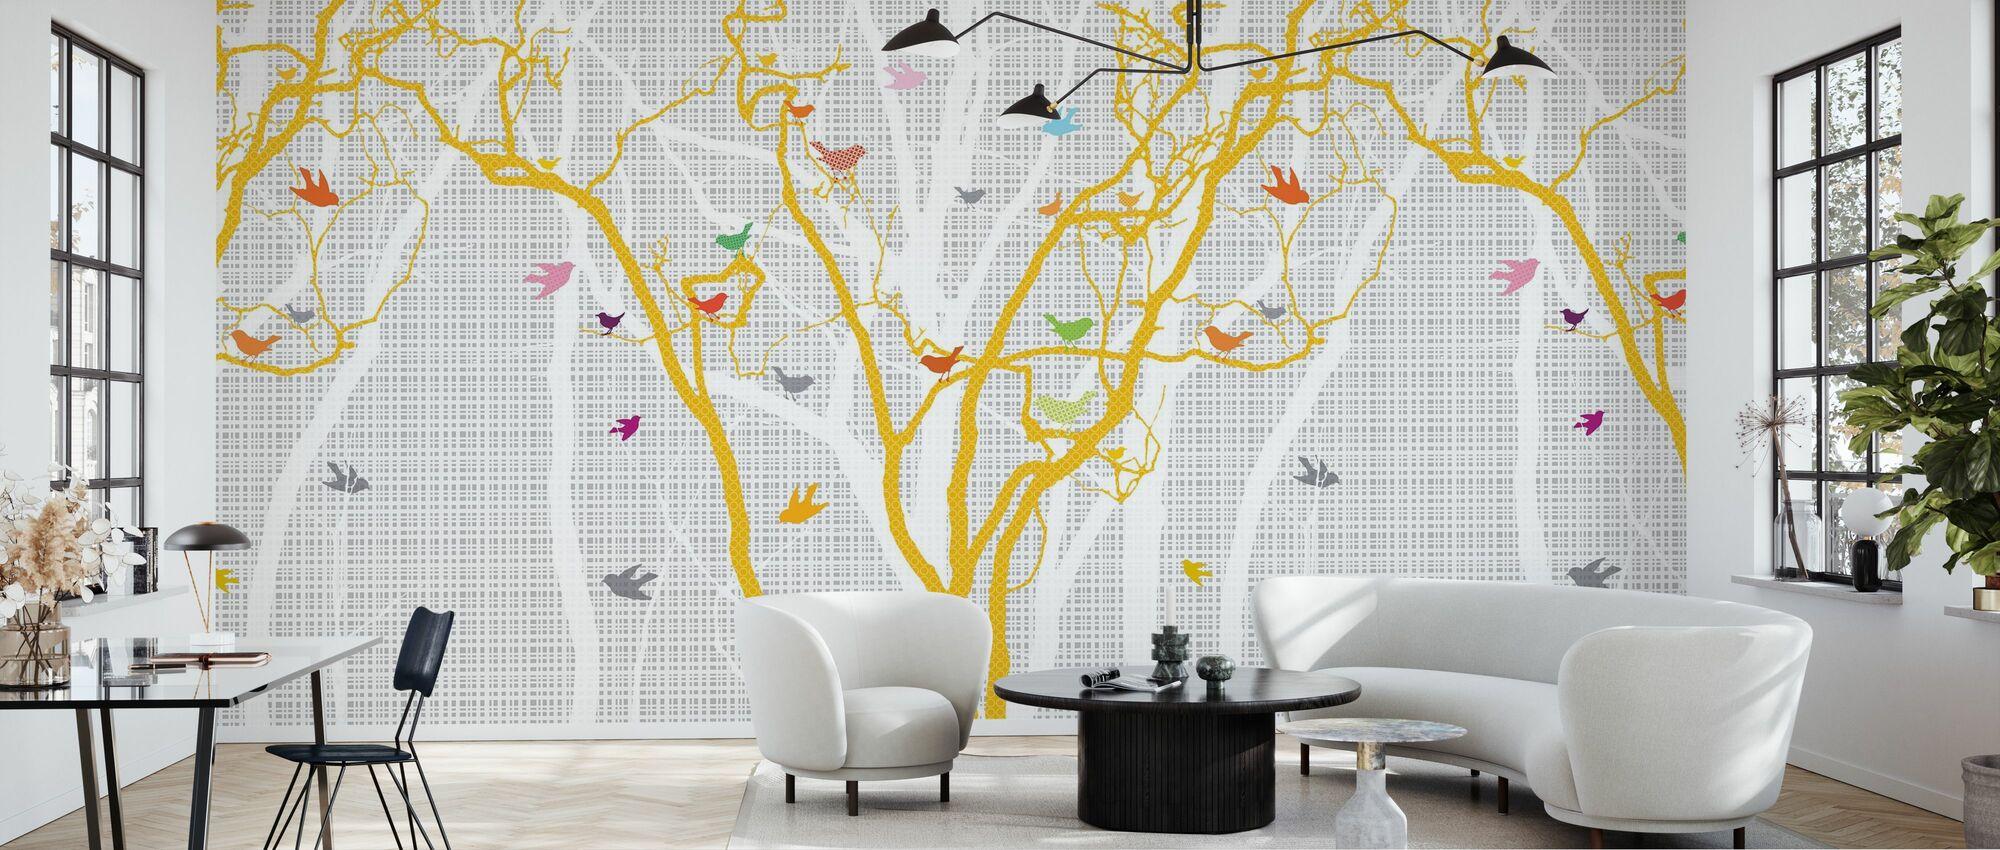 Hide and Seek - Sunshine - Wallpaper - Living Room